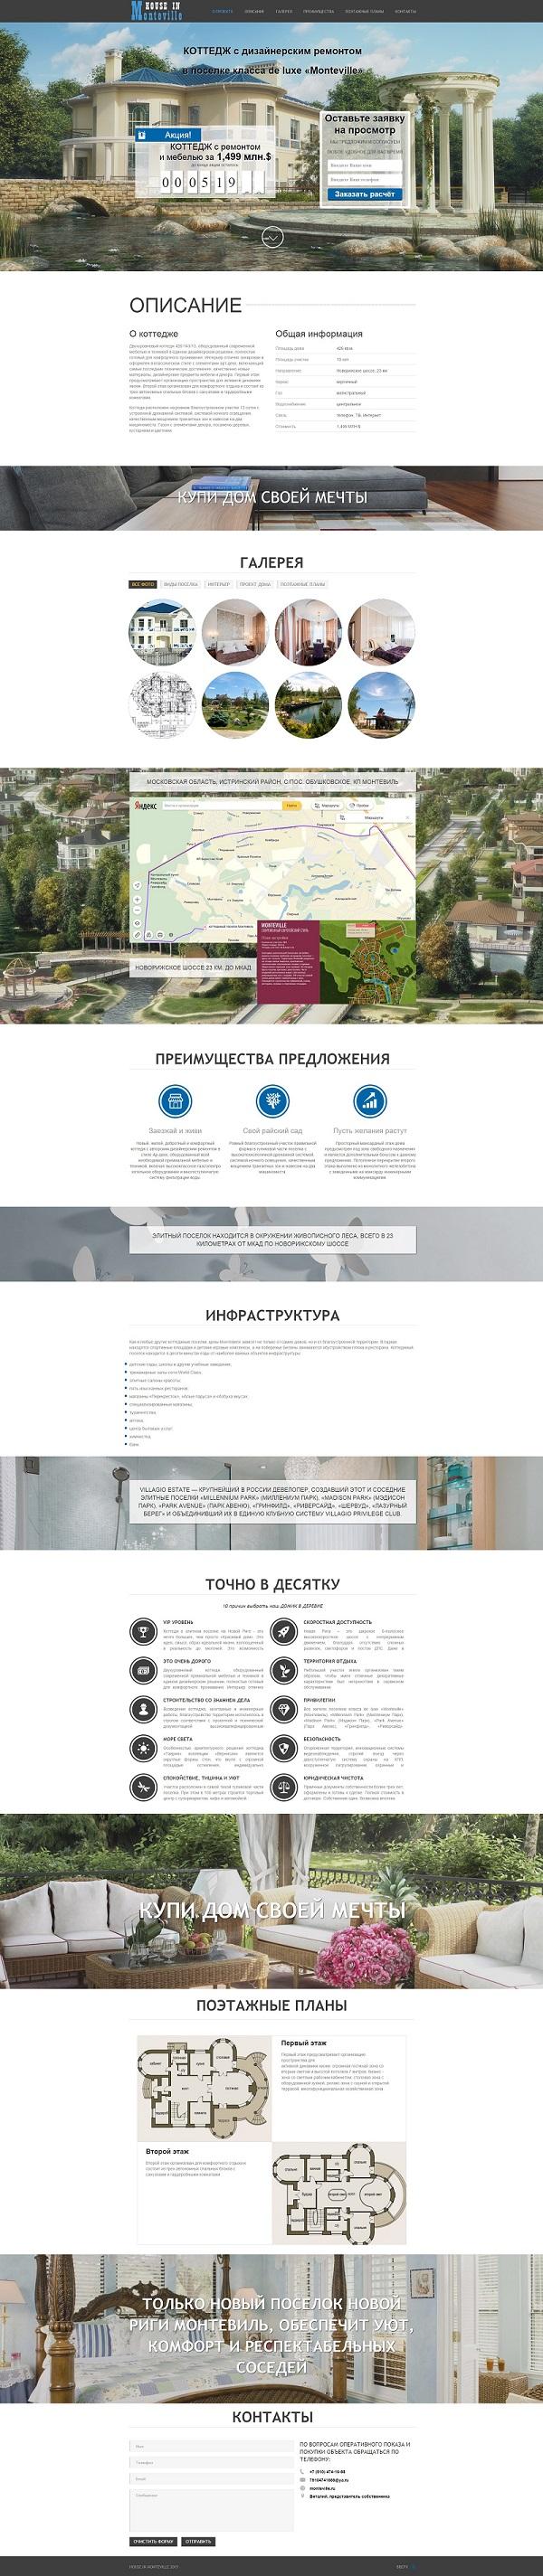 Сайт по продаже дома